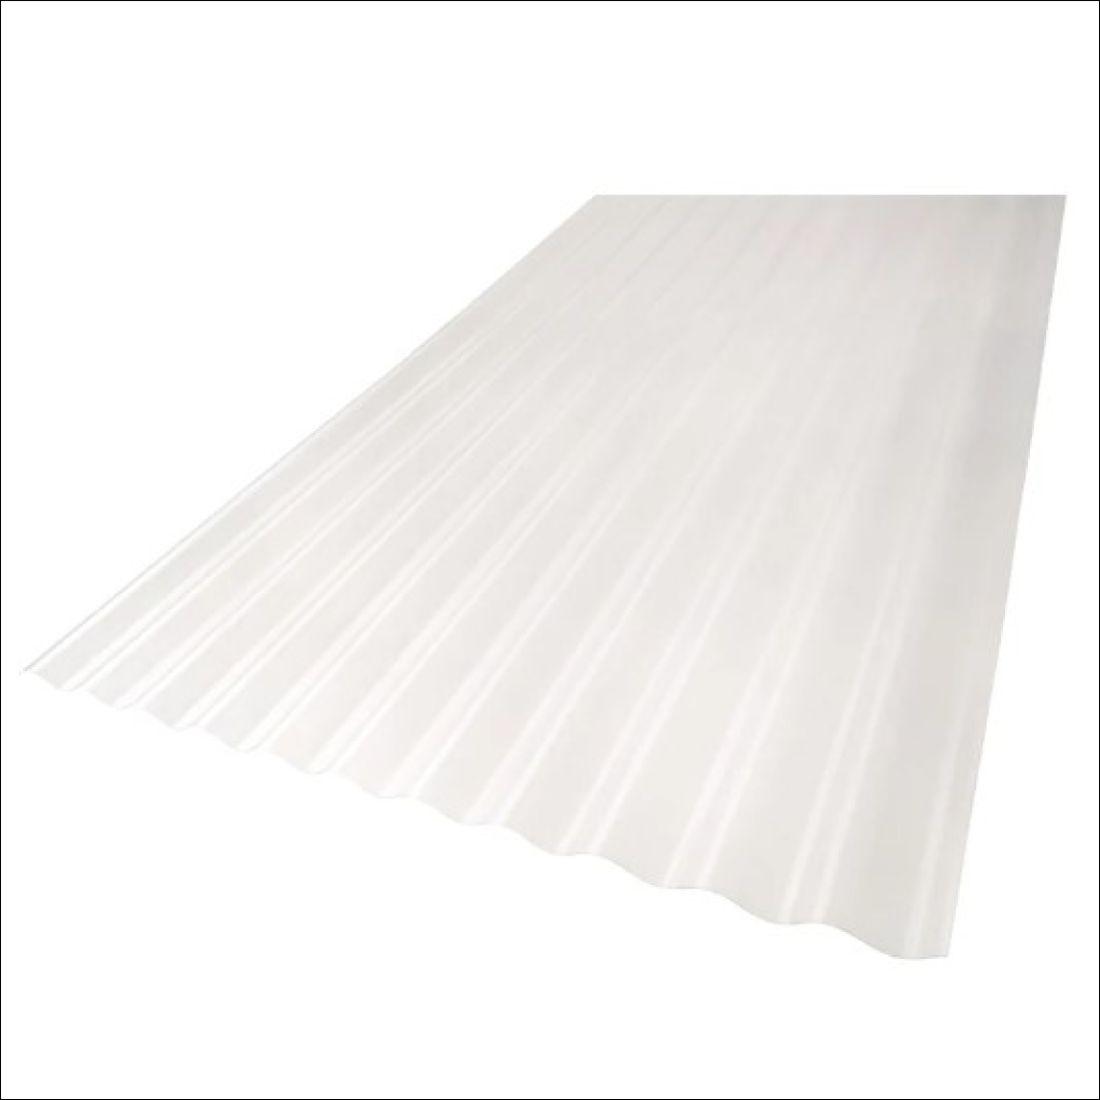 Corrugated Clear 7200 x 860mm